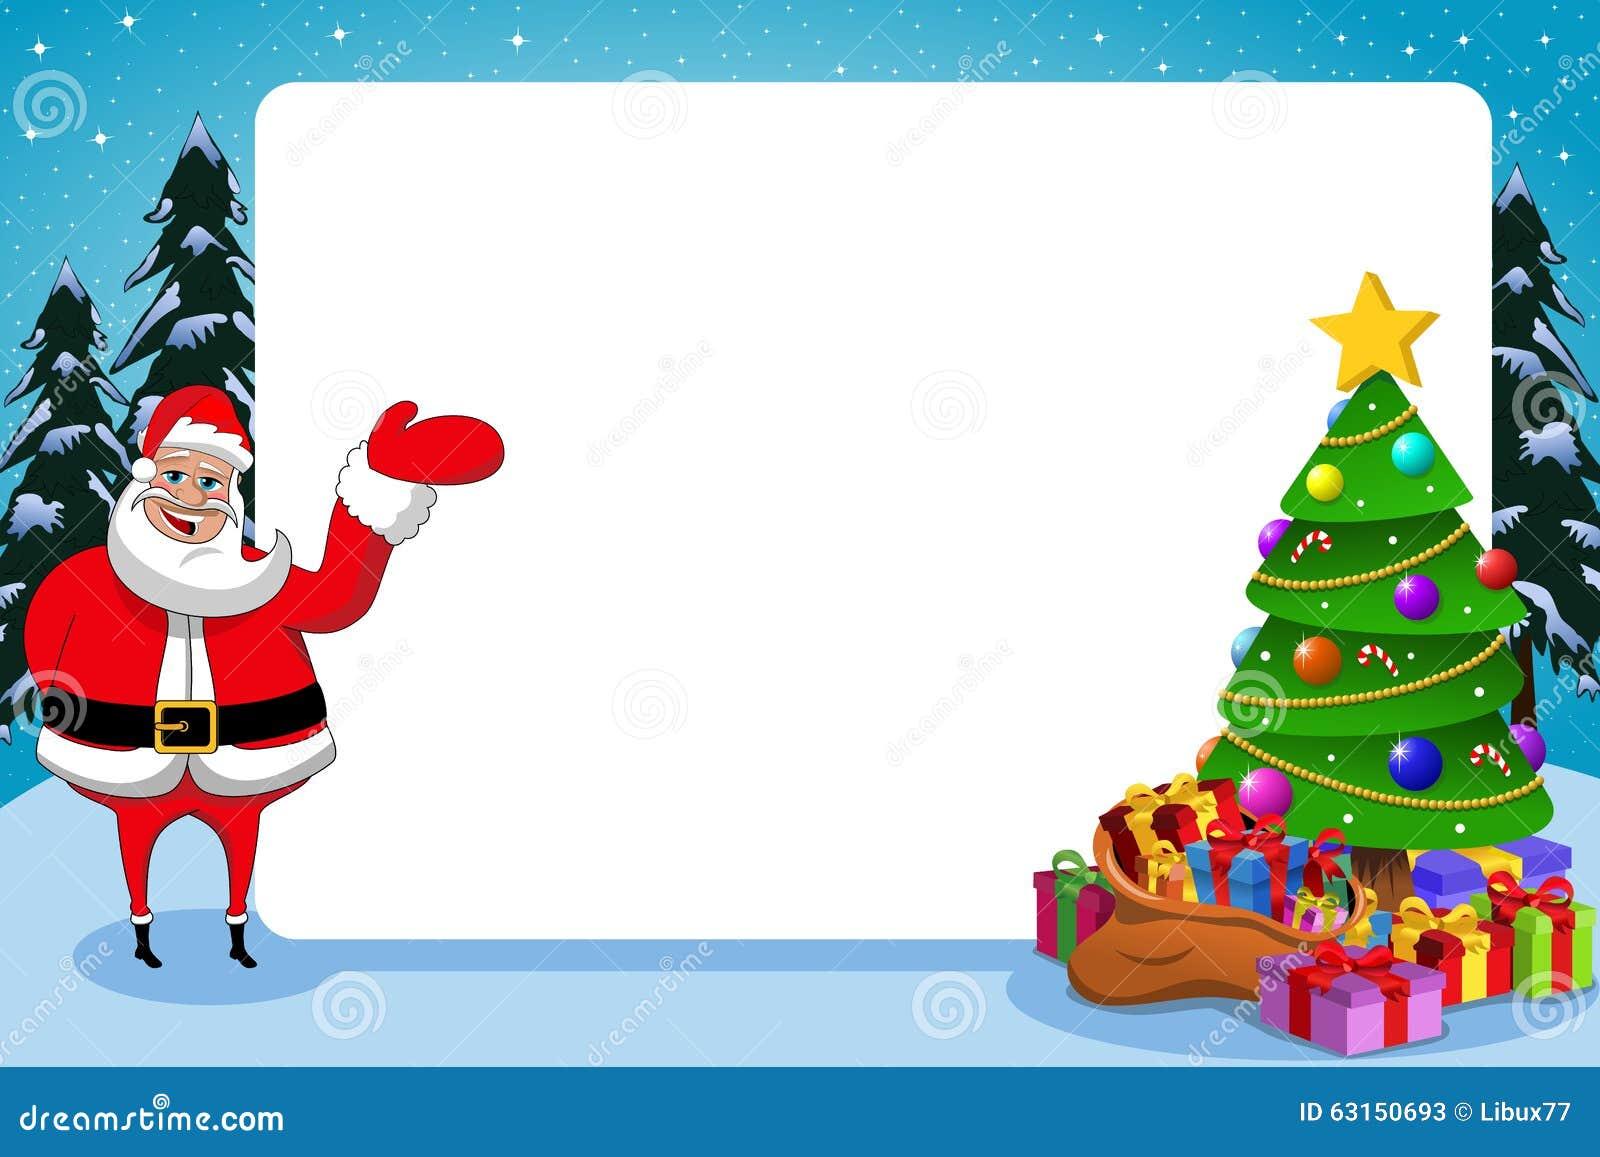 Santa Claus Frame Xmas Tree Stock Vector - Image: 63150693